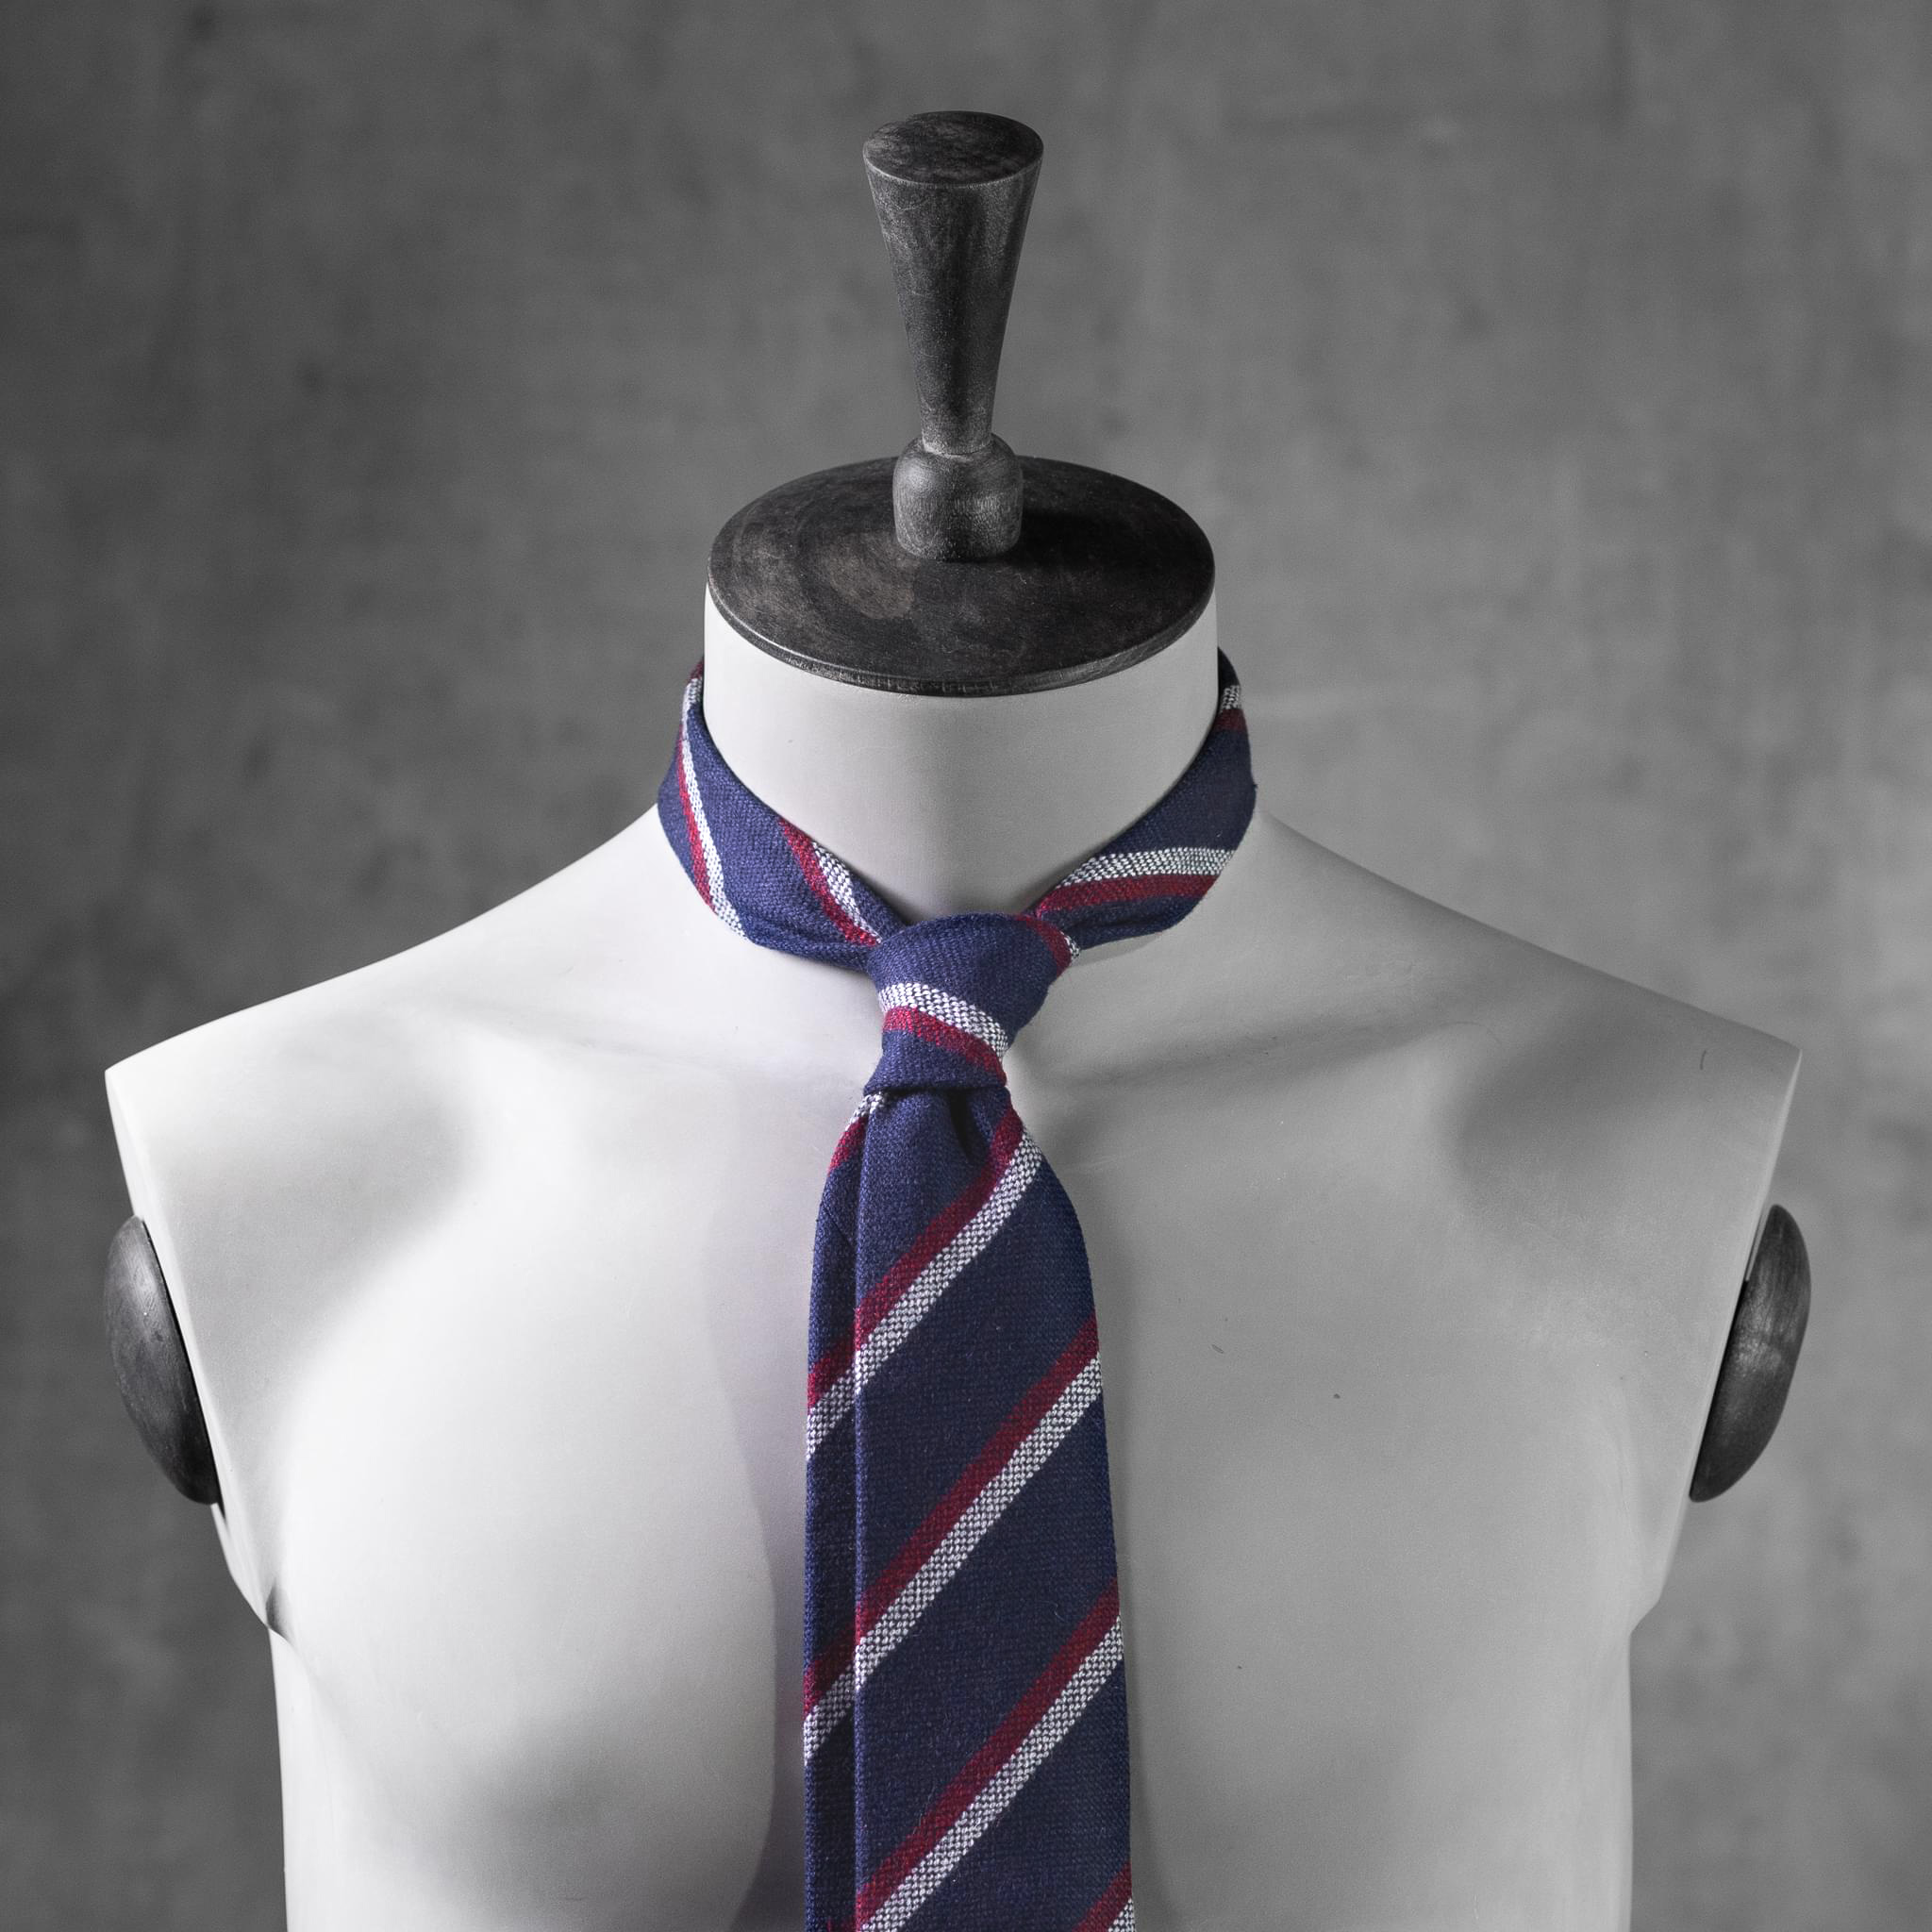 WOOL-LANA-0519-Tie-Initials-Corbata-Iniciales-The-Seelk-2